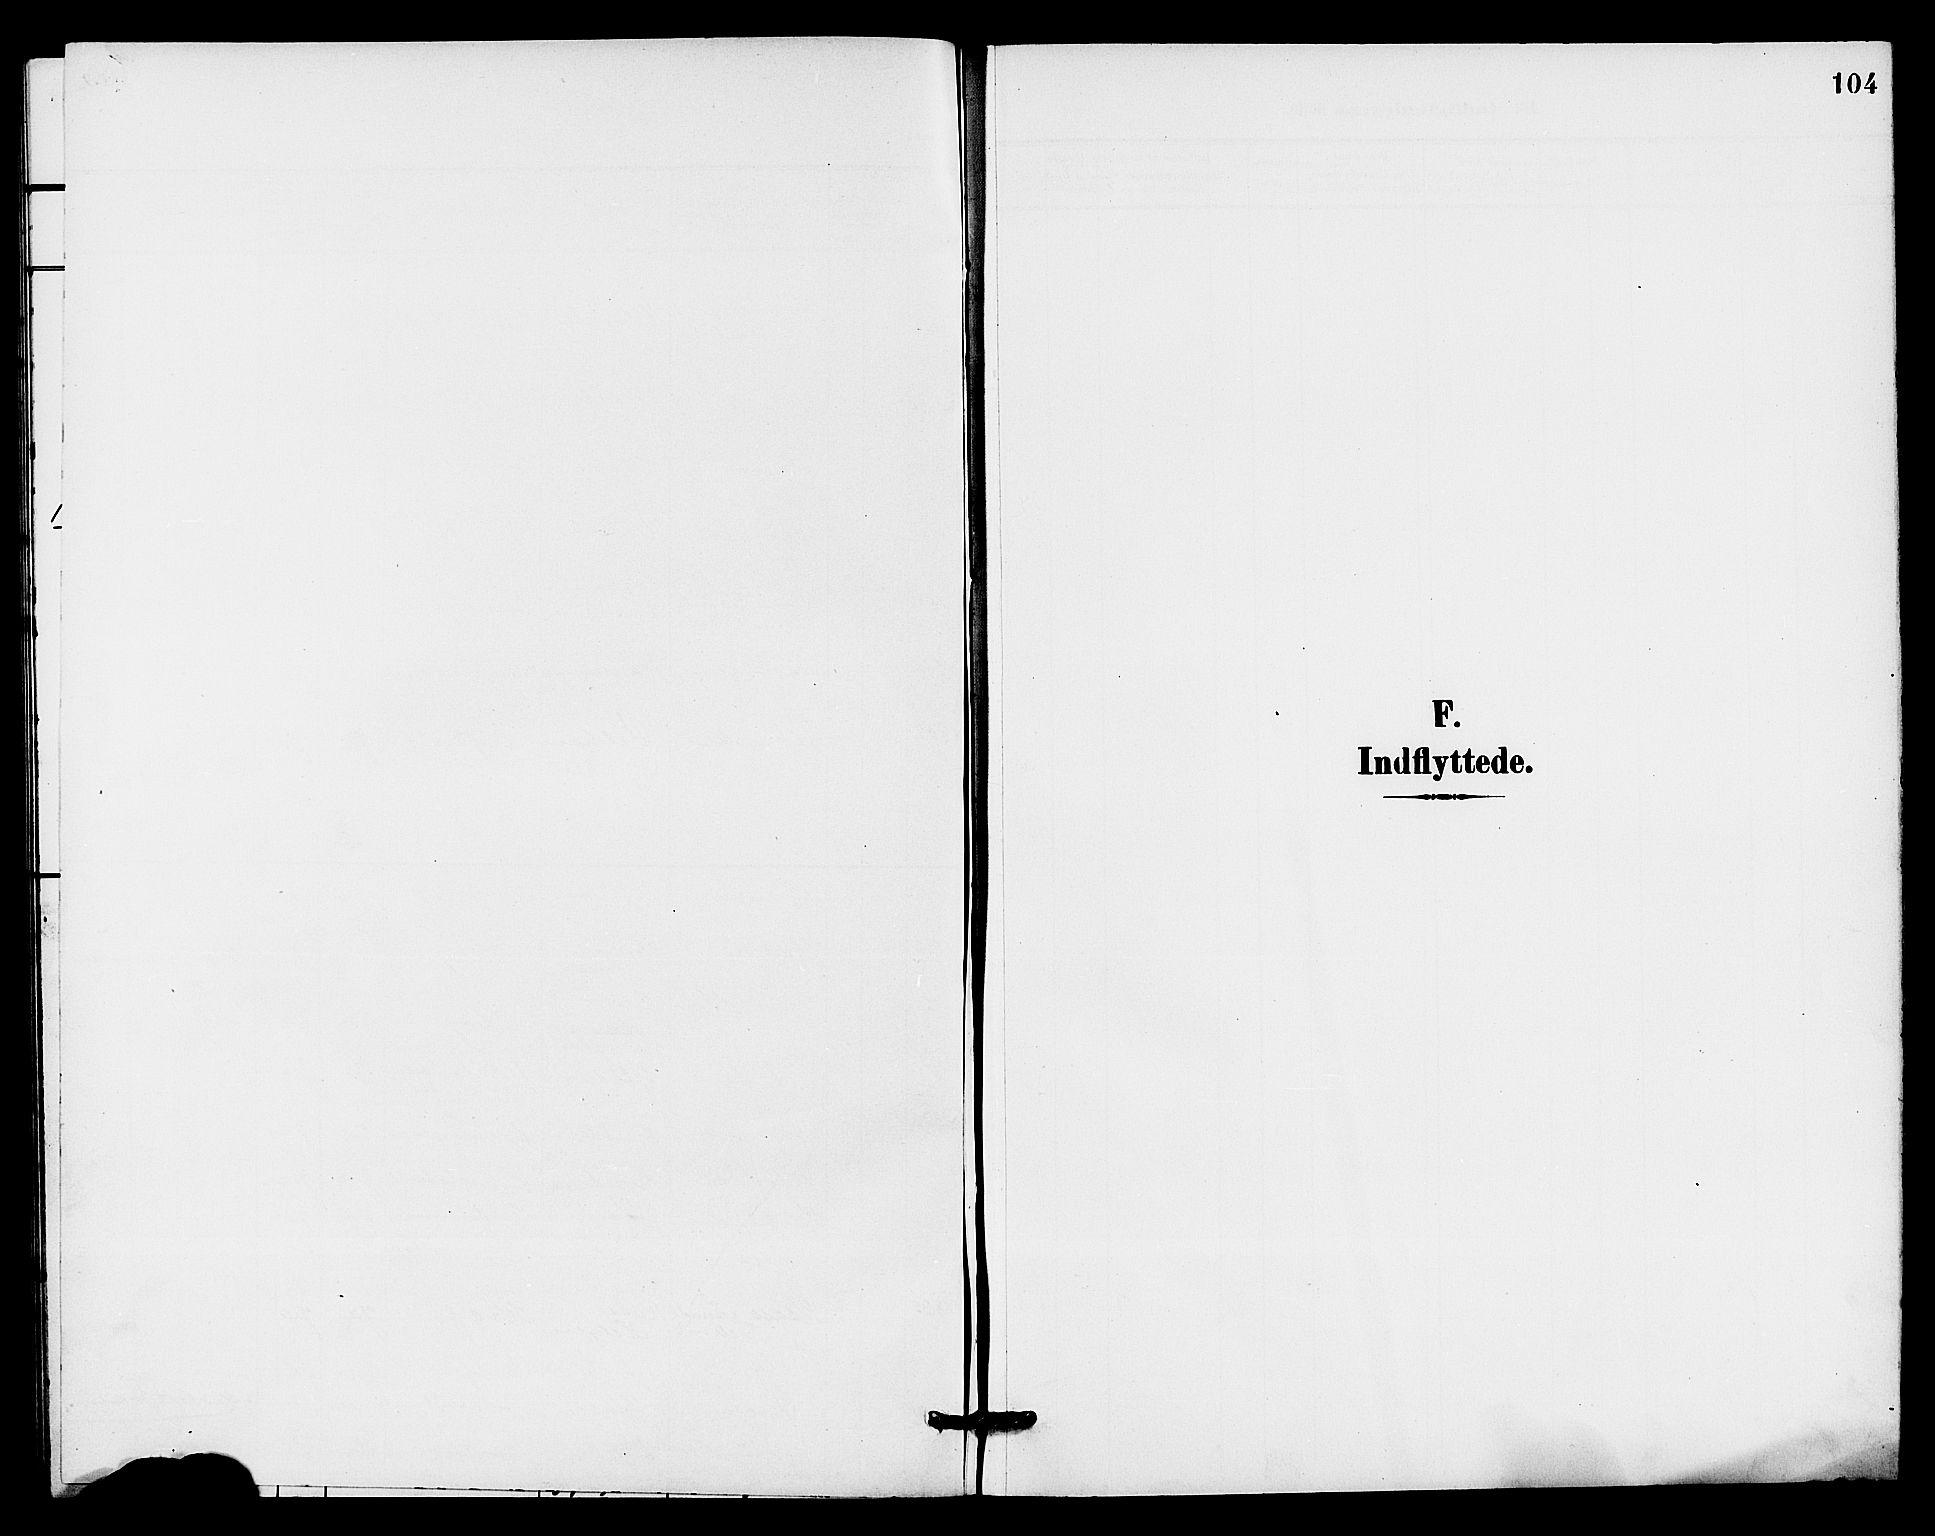 SAKO, Holla kirkebøker, G/Gb/L0002: Klokkerbok nr. II 2, 1897-1913, s. 104